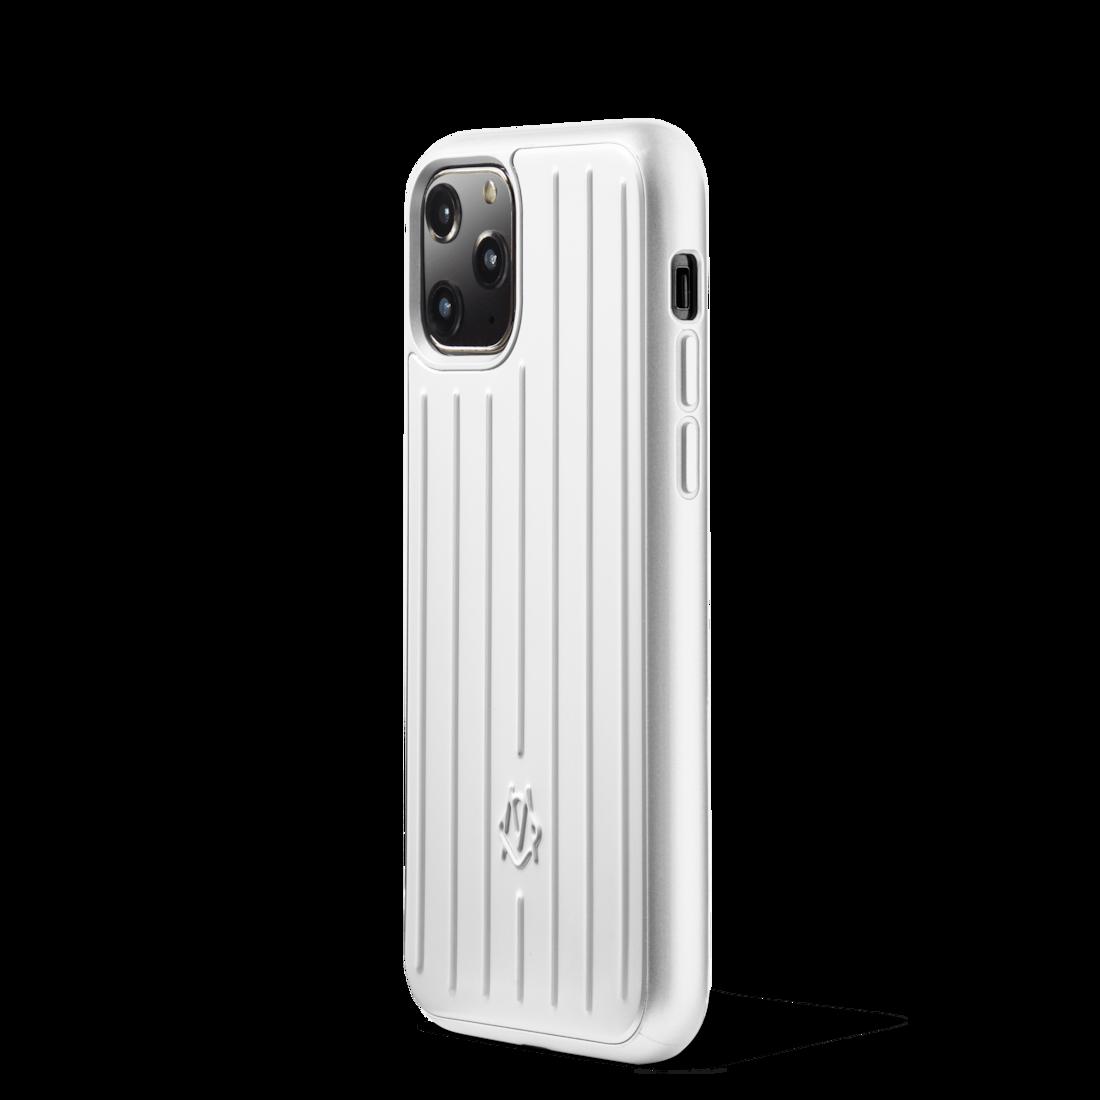 Coque pour iPhone 11 Pro en aluminium | Argent | RIMOWA